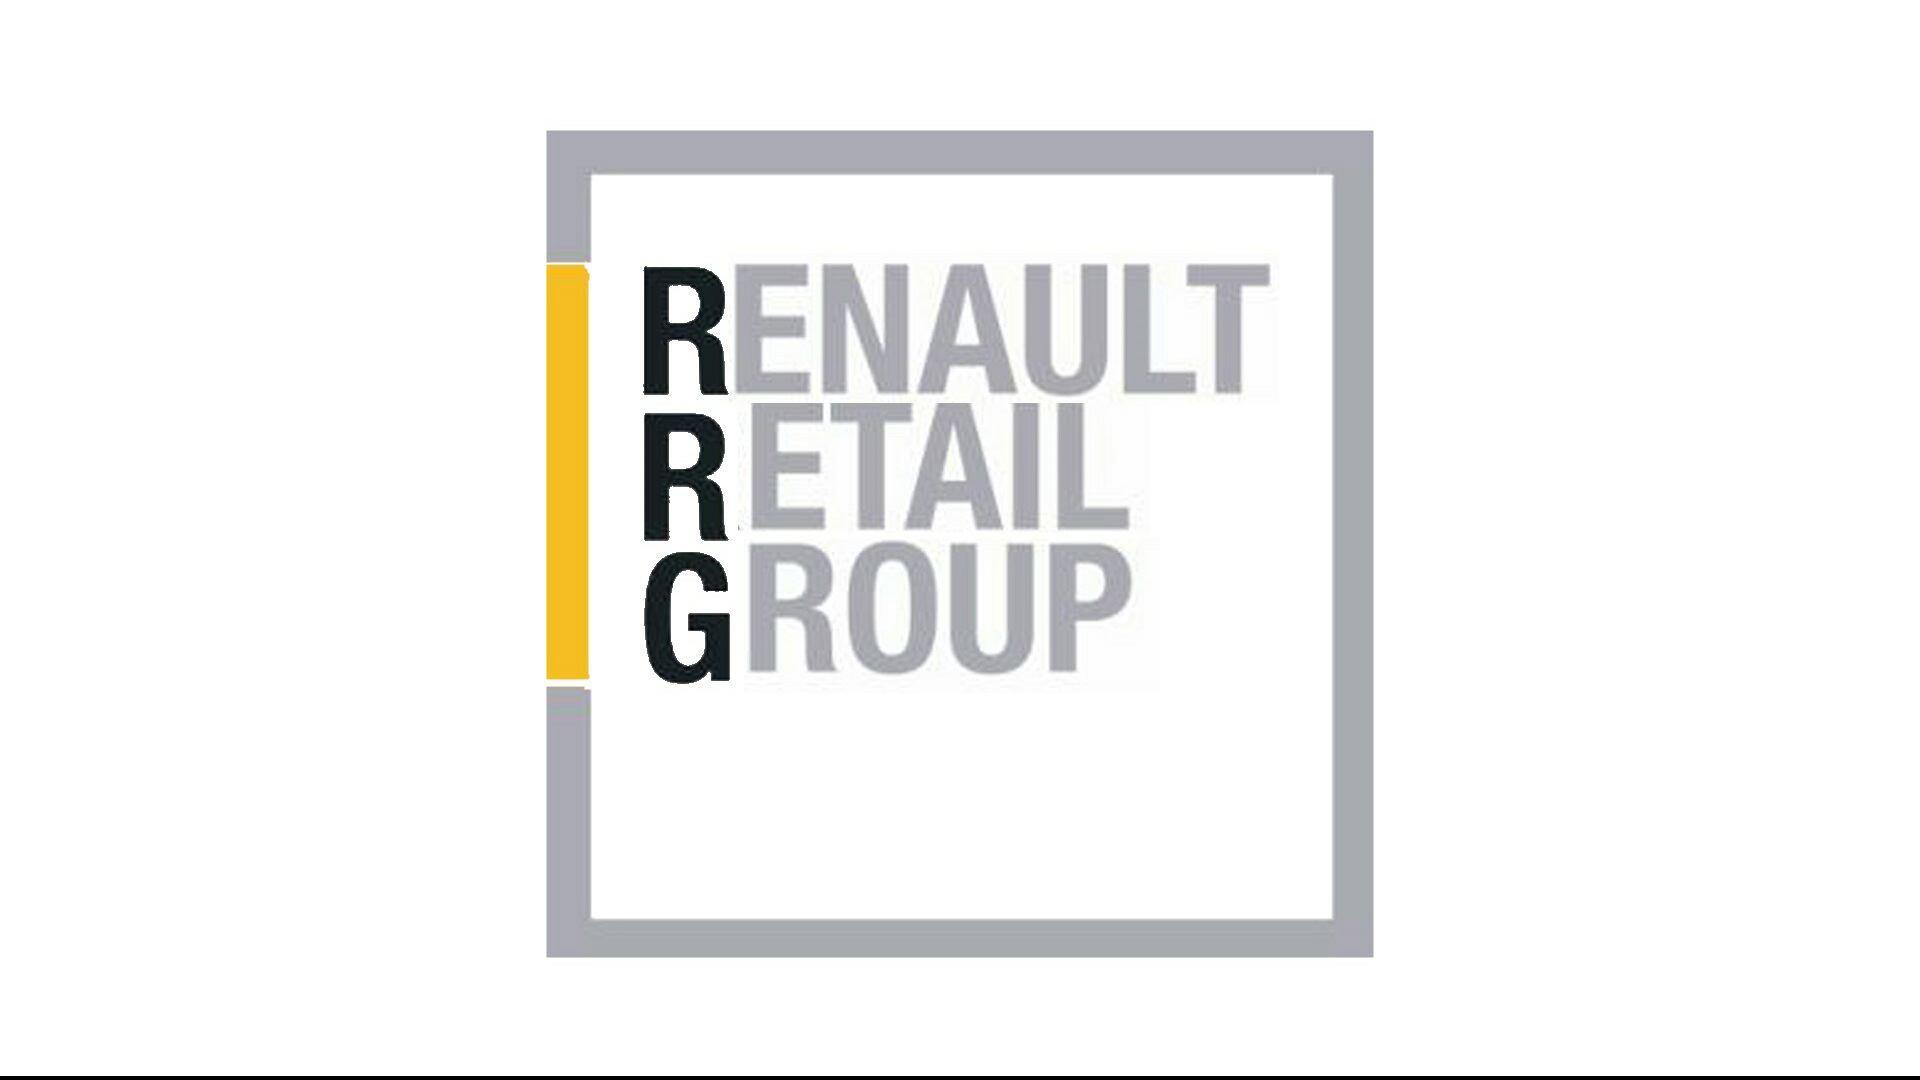 renault retail group occasion aubagne renault retail group concessionnaire renault aubagne auto. Black Bedroom Furniture Sets. Home Design Ideas